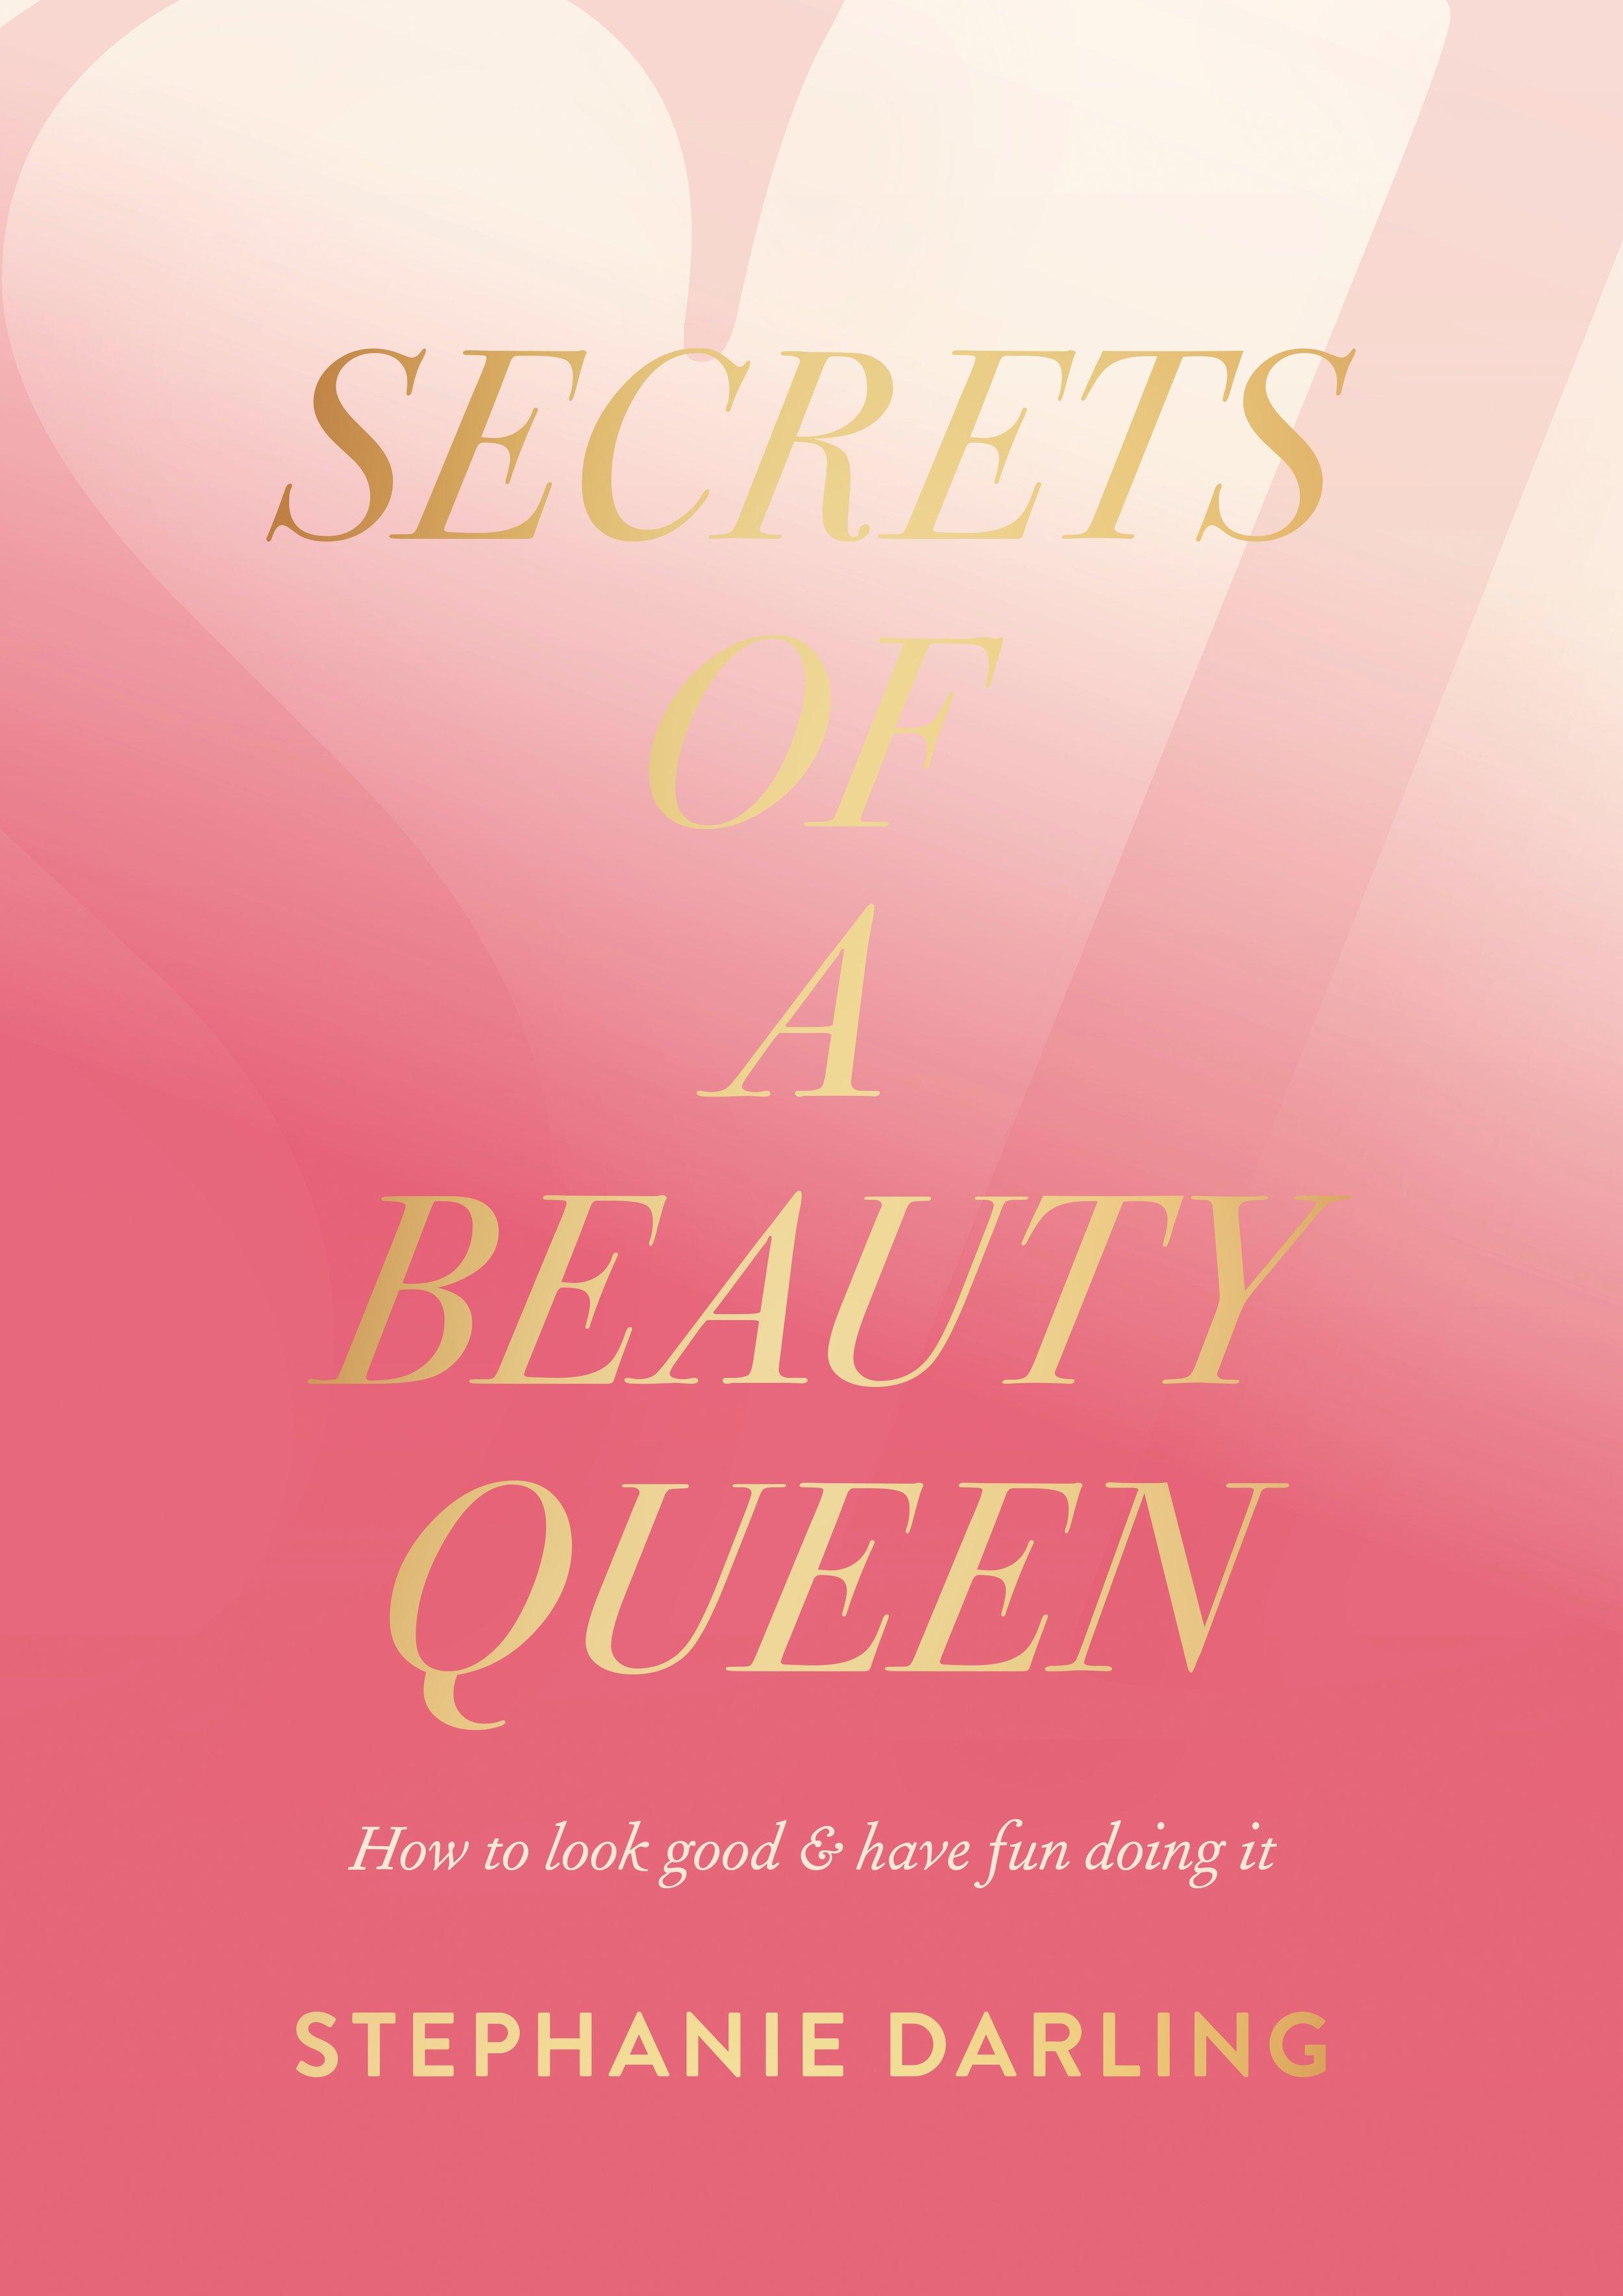 Secrets of a Beauty Queen cover.jpg